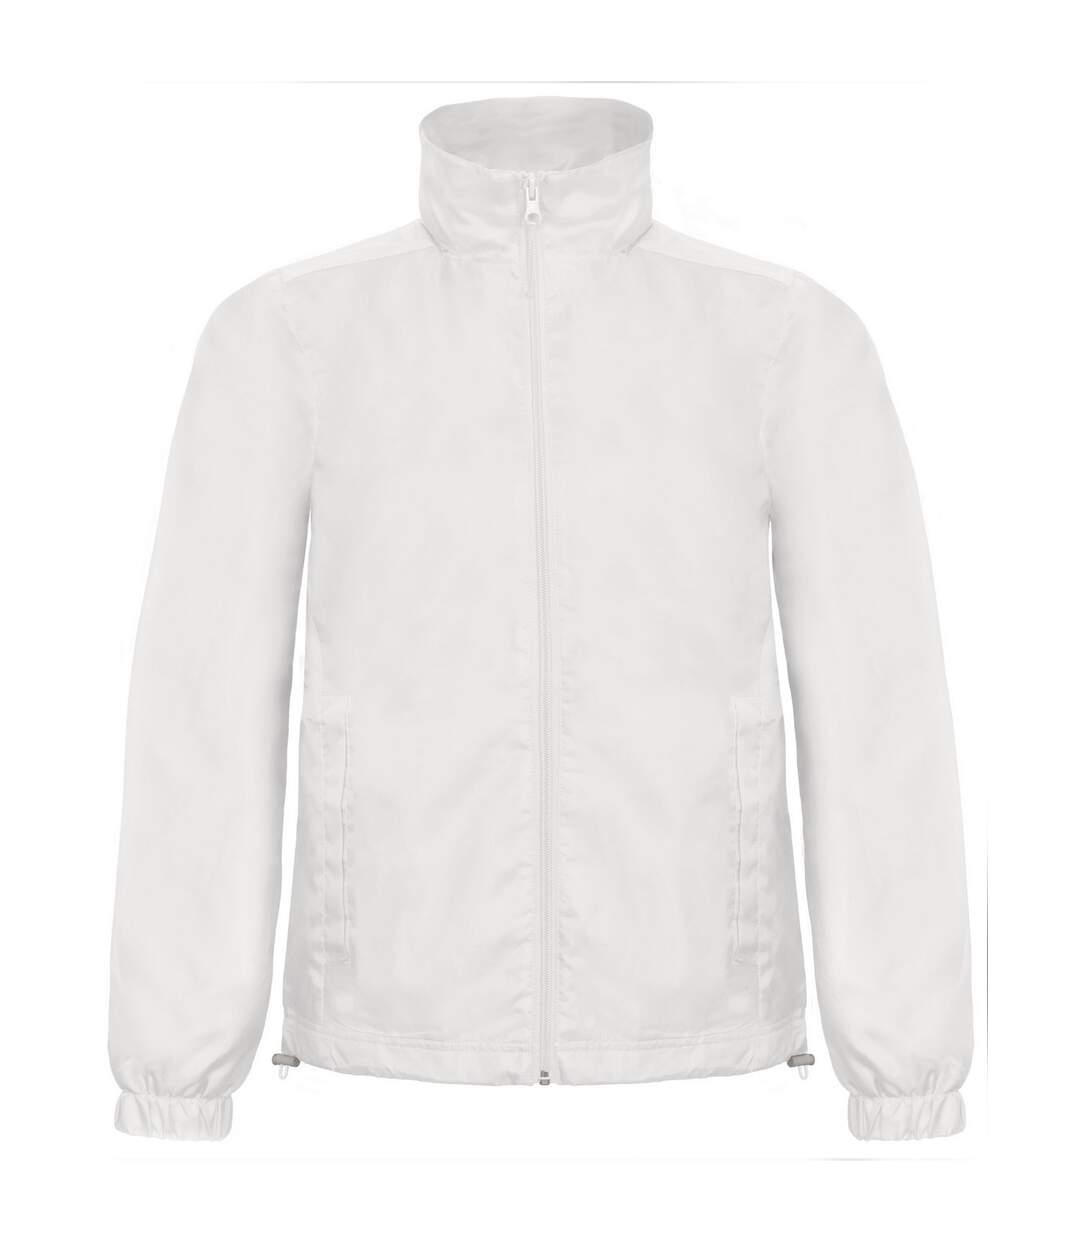 B&C Mens ID.601 Hooded Showerproof Windbreaker Jacket (Black) - UTRW3524